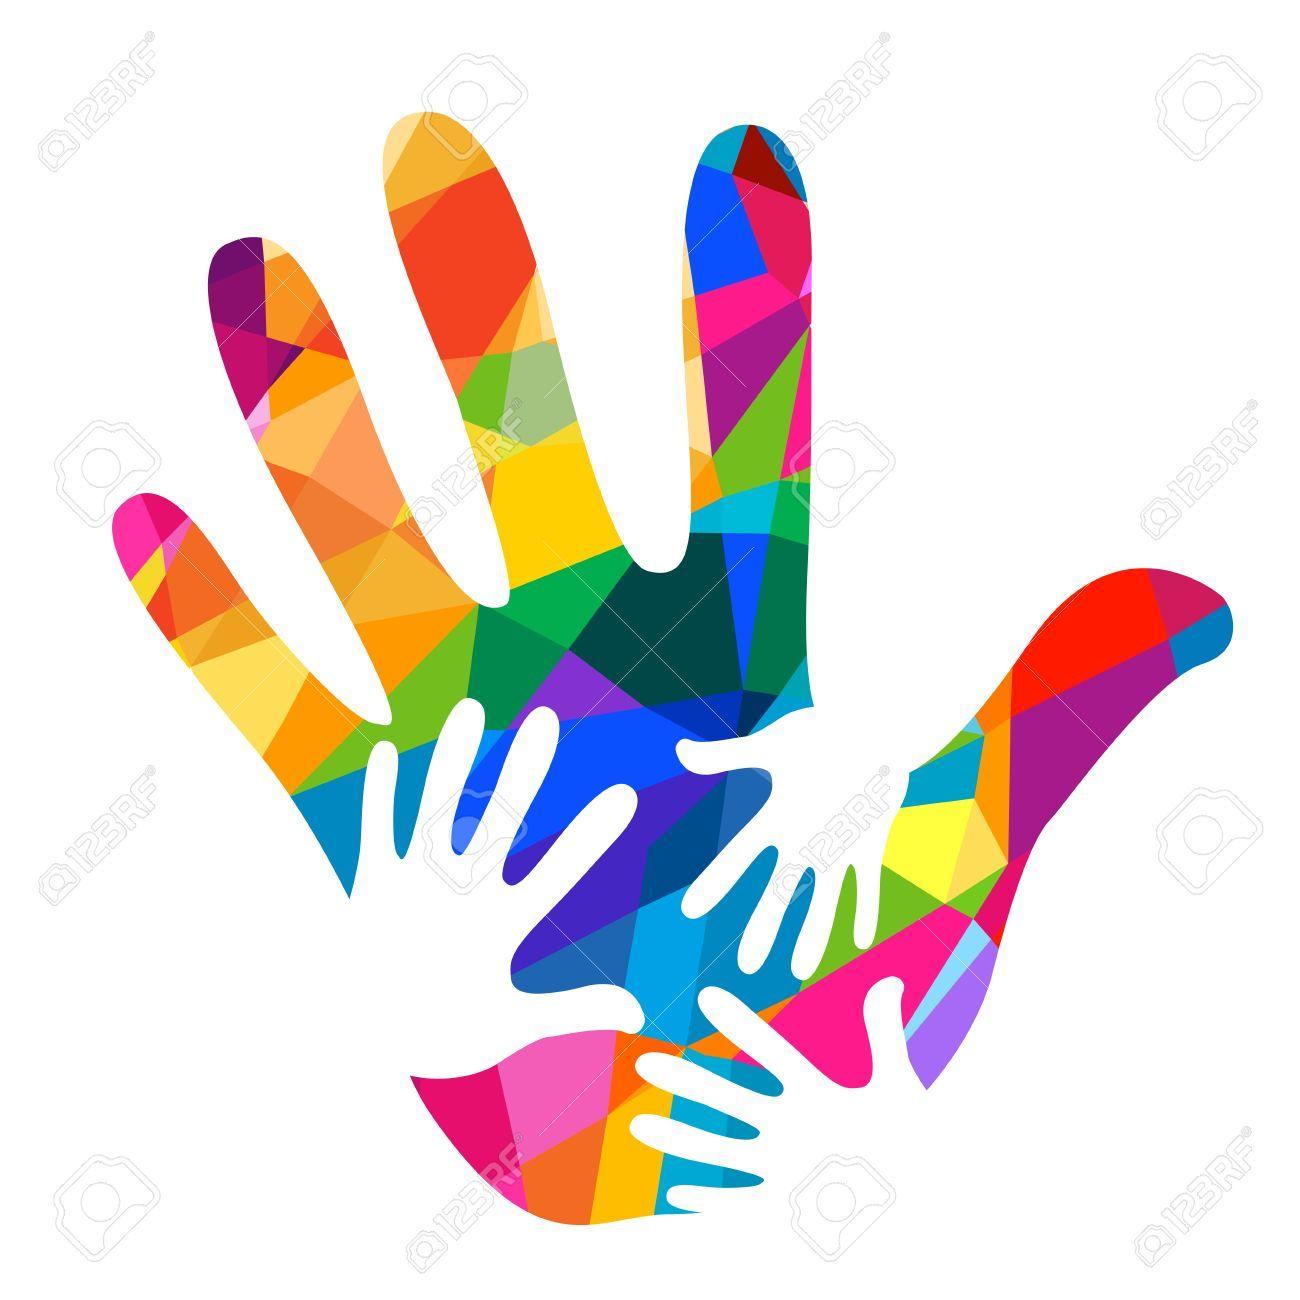 Hands Helping Illustration Background Illustration Ad Helping Hands Illustration Illustration Background Hand Illustration Art Logo Hand Logo